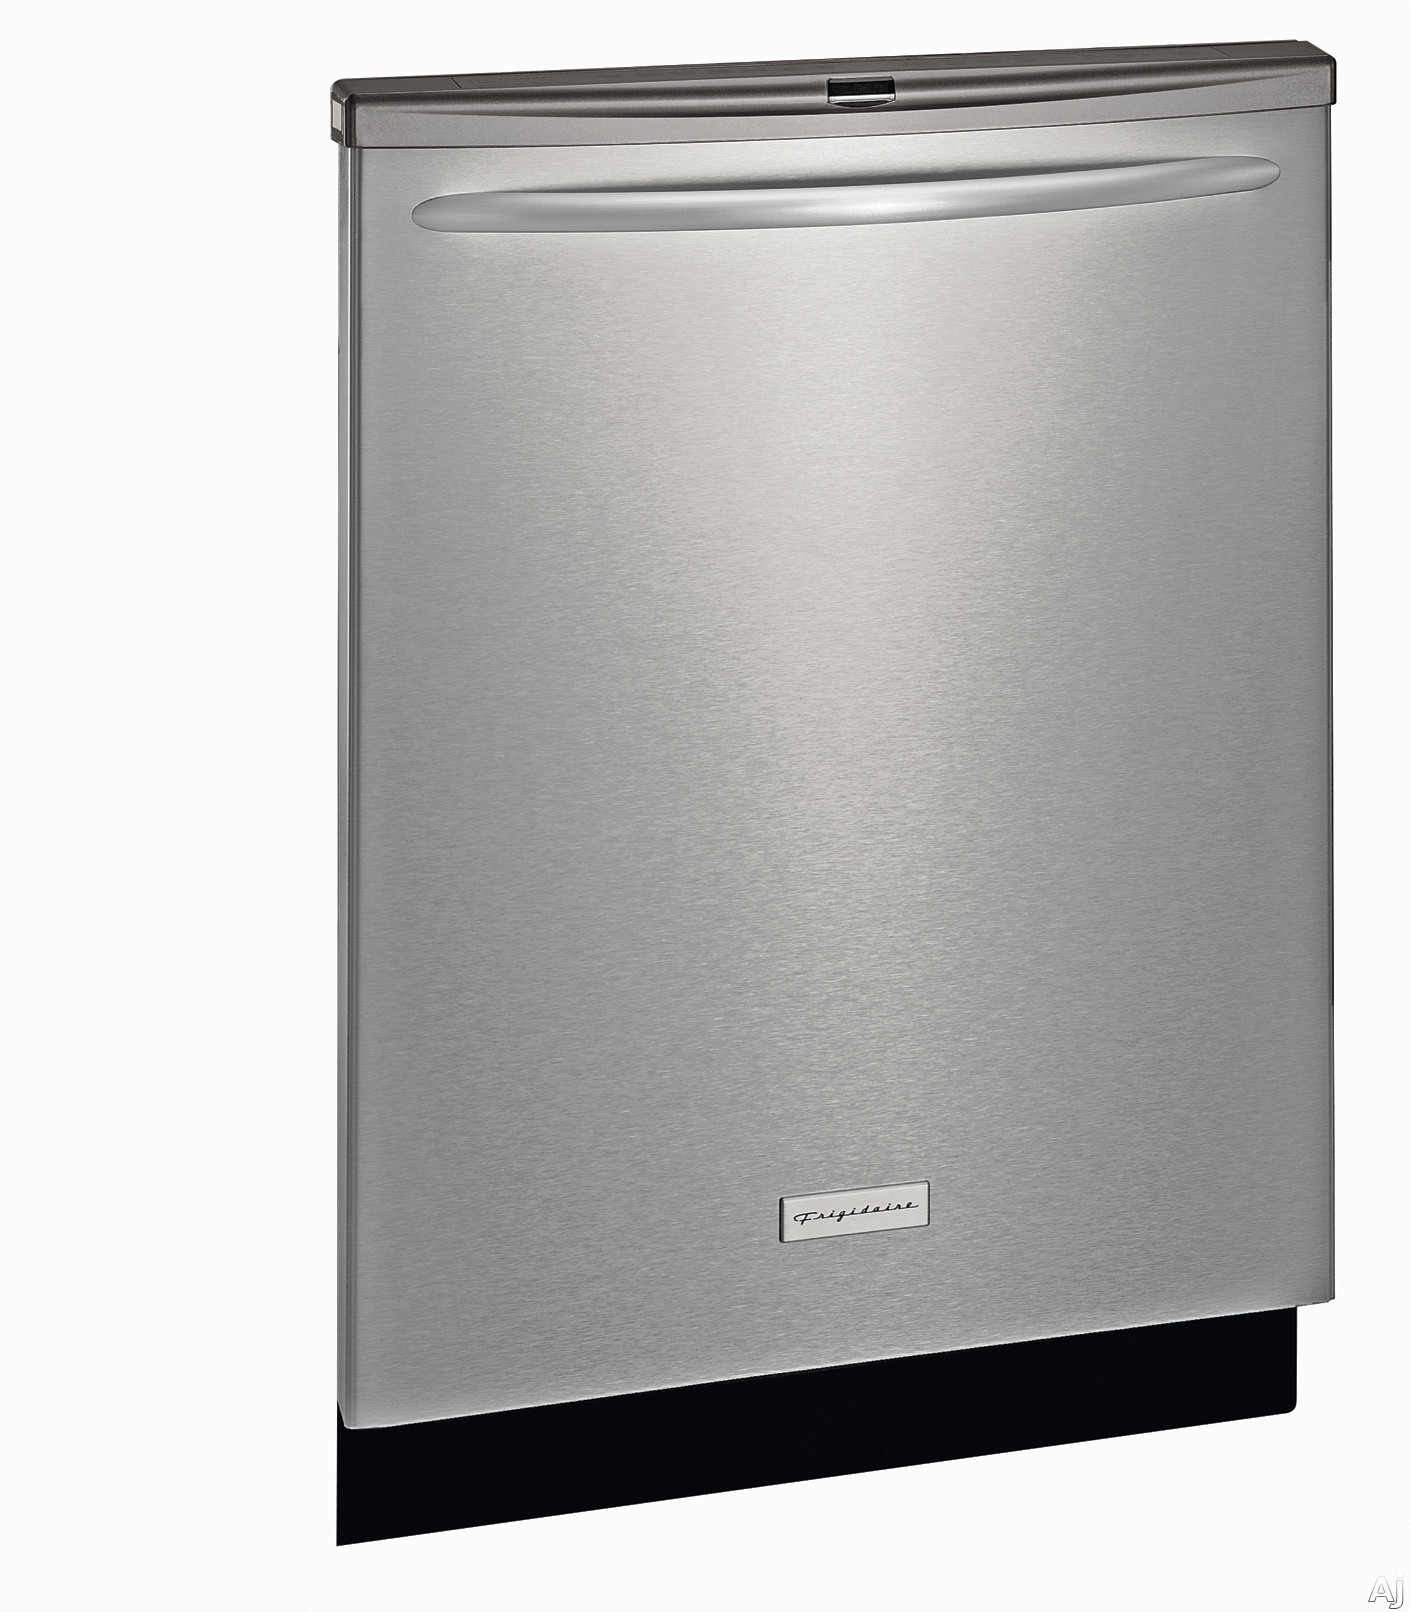 Frigidaire Pld4375rfc Fully Integrated Dishwasher Manual